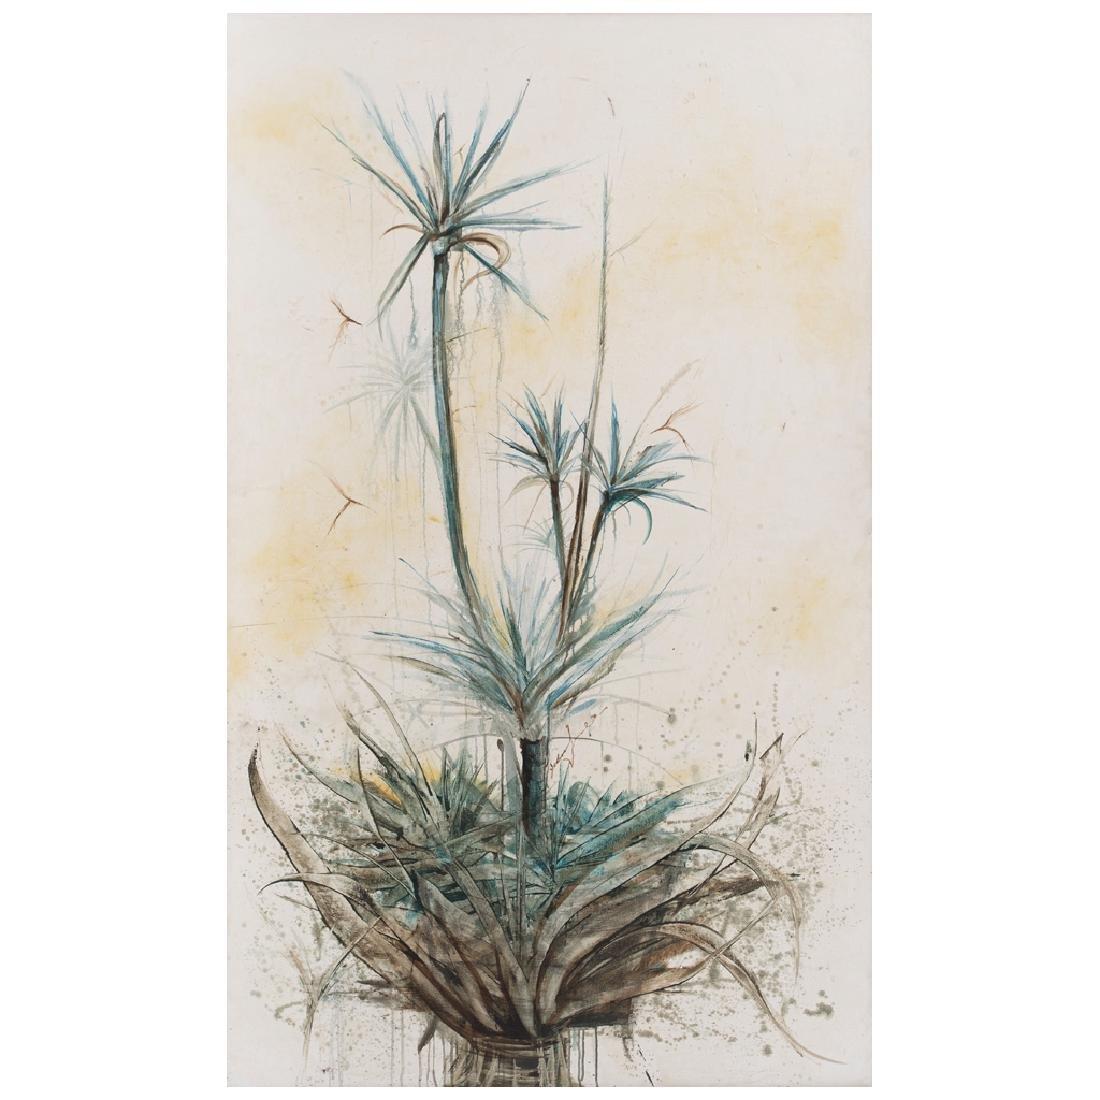 EBER CHaVEZ, Naturaleza II, Signed, Mixed on canvas,